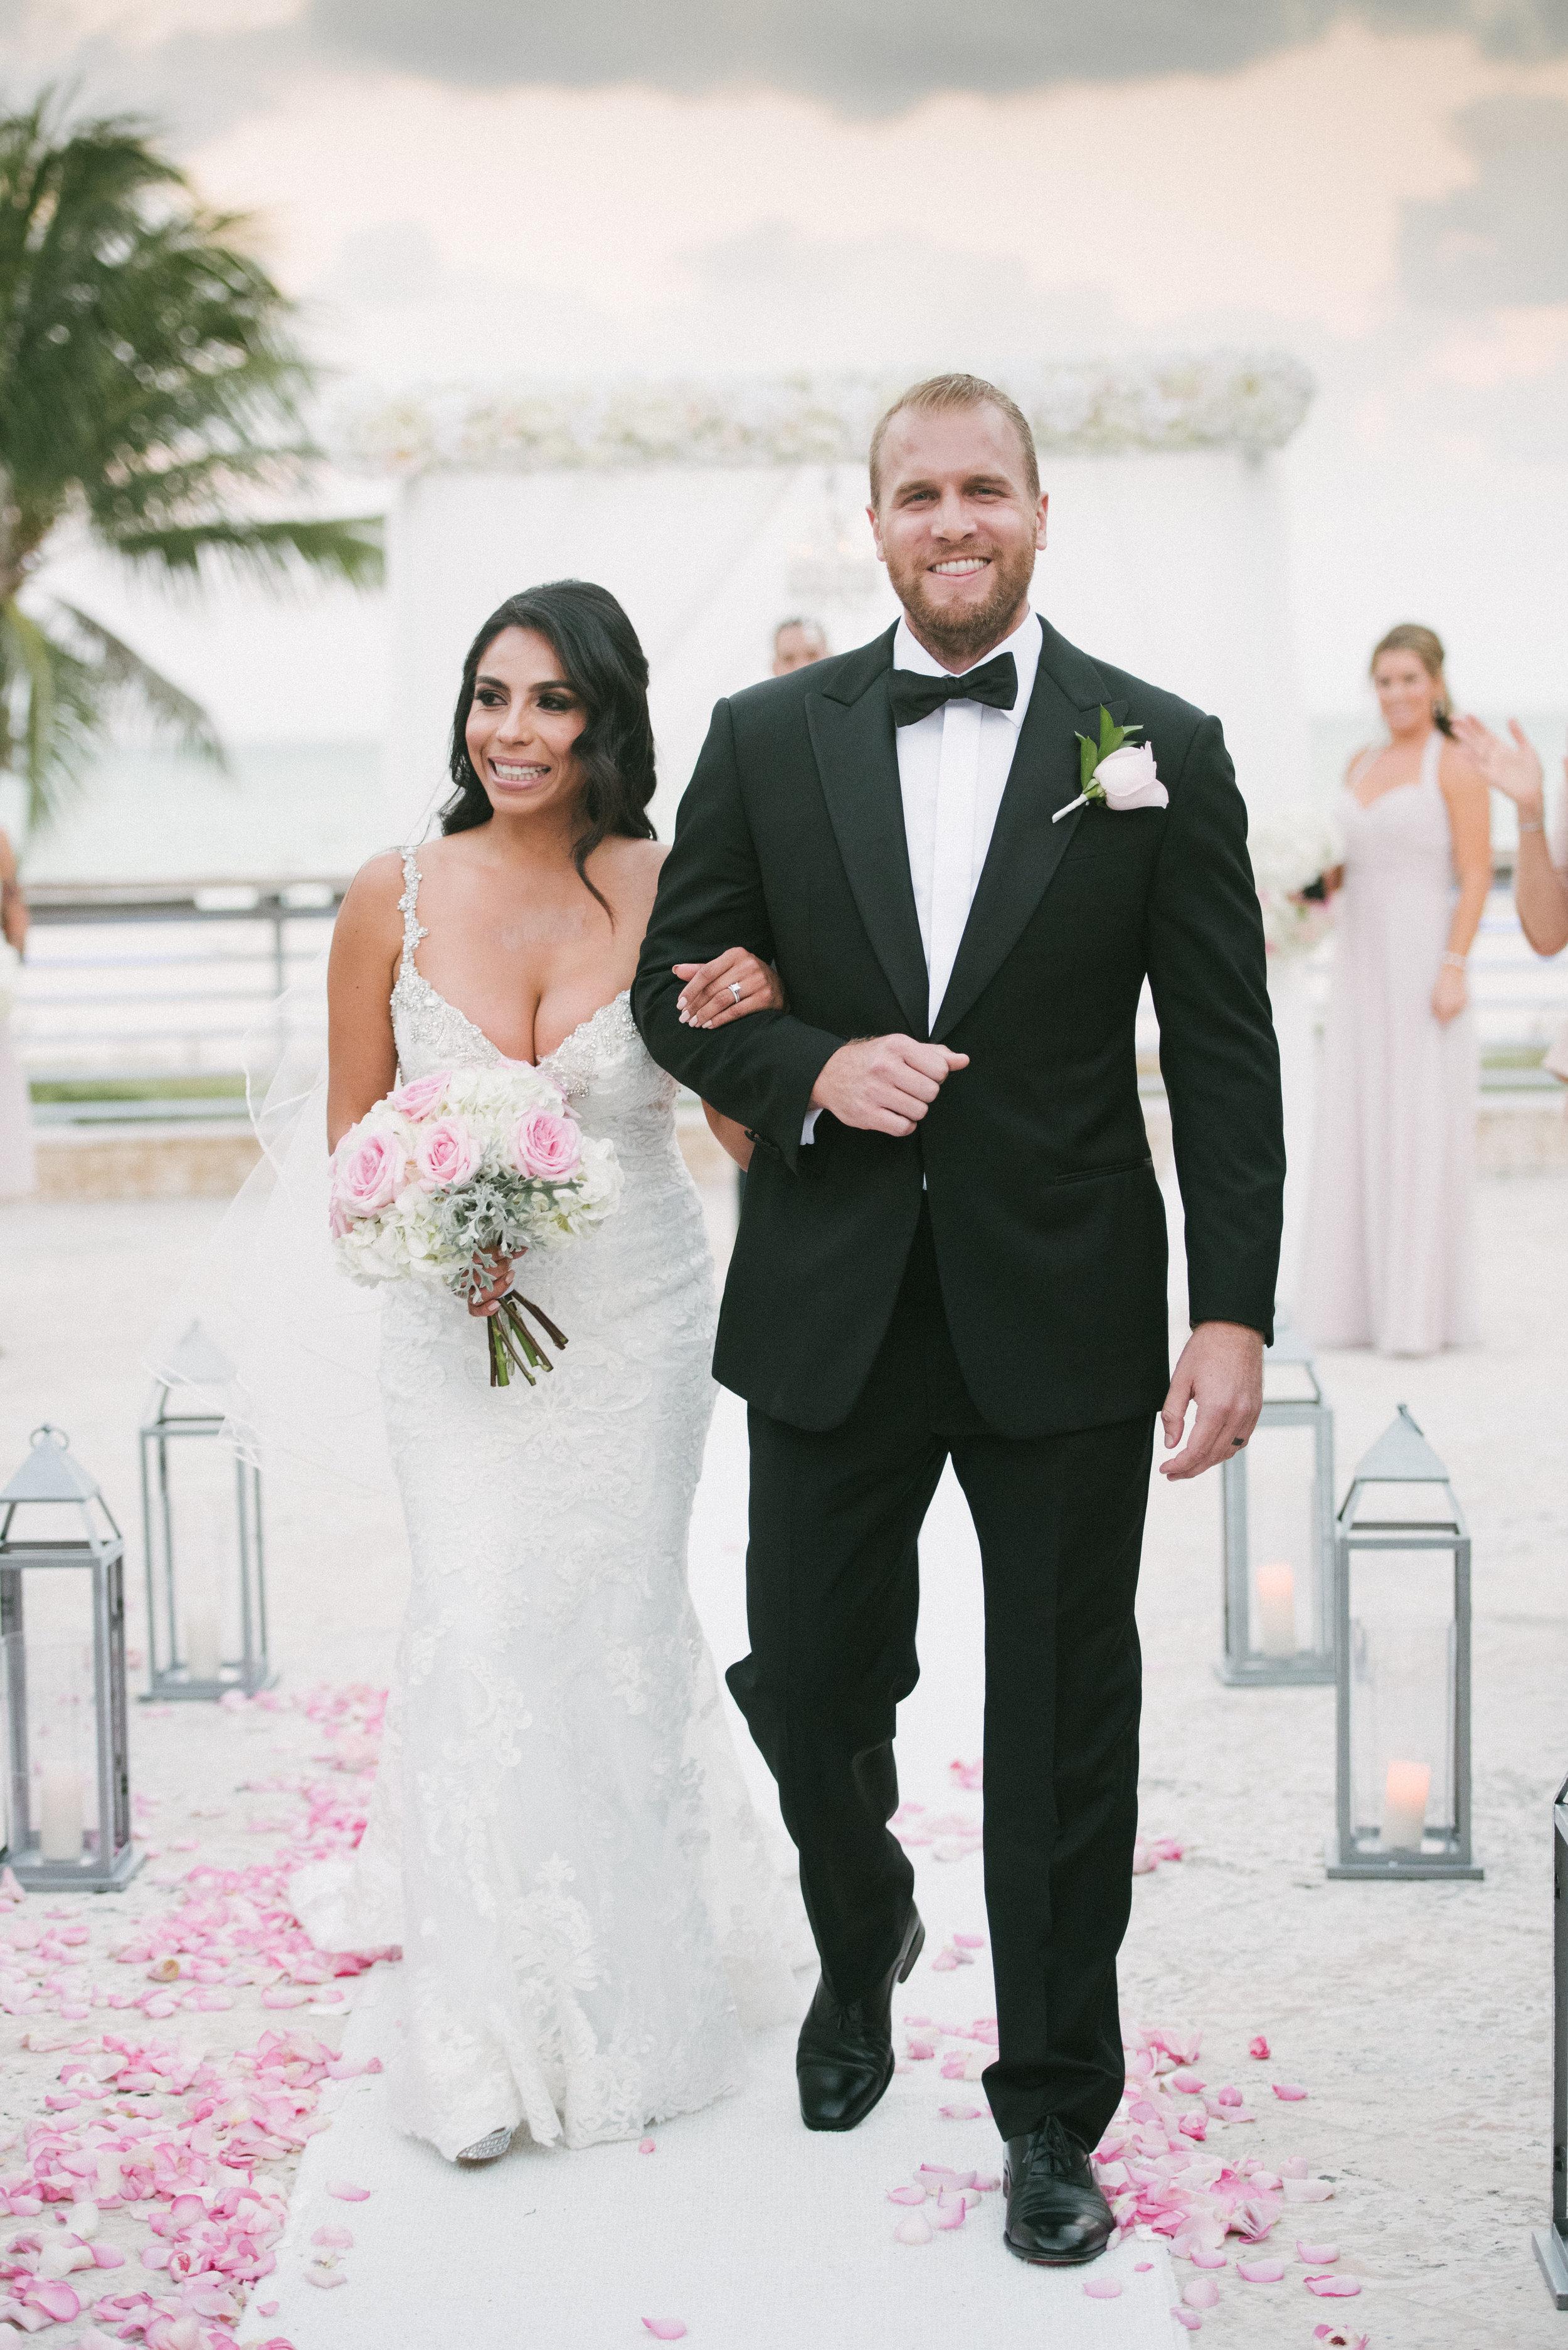 Jenny & Nick Wedding | Miami Oct8th2016 | Highlights-0025.jpg